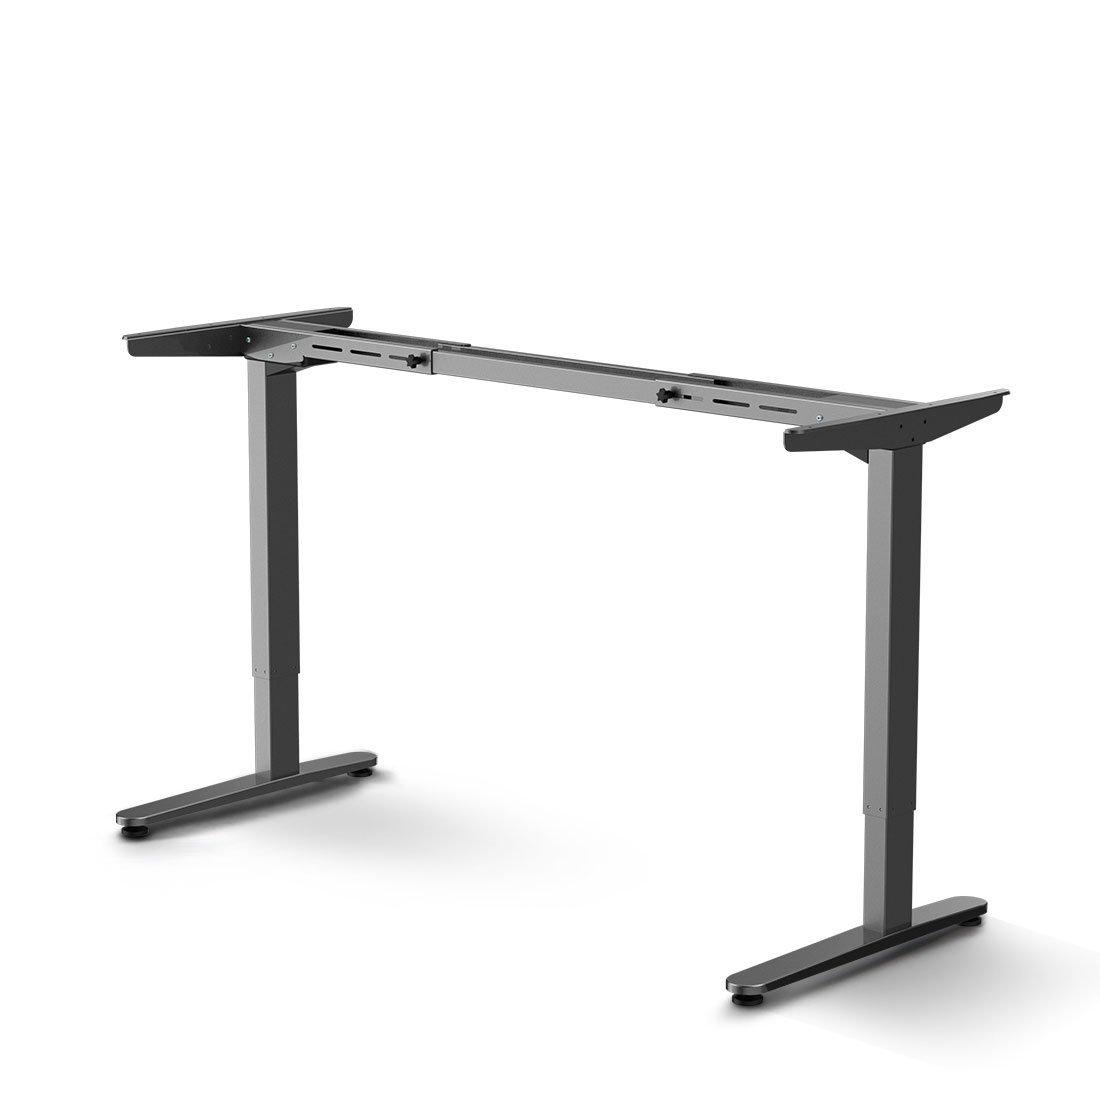 Flexispot E2S Electric Height Adjustable Desk Anti-Collision Technology Heavy Duty Desk Leg (Silver Frame Only) by FLEXISPOT